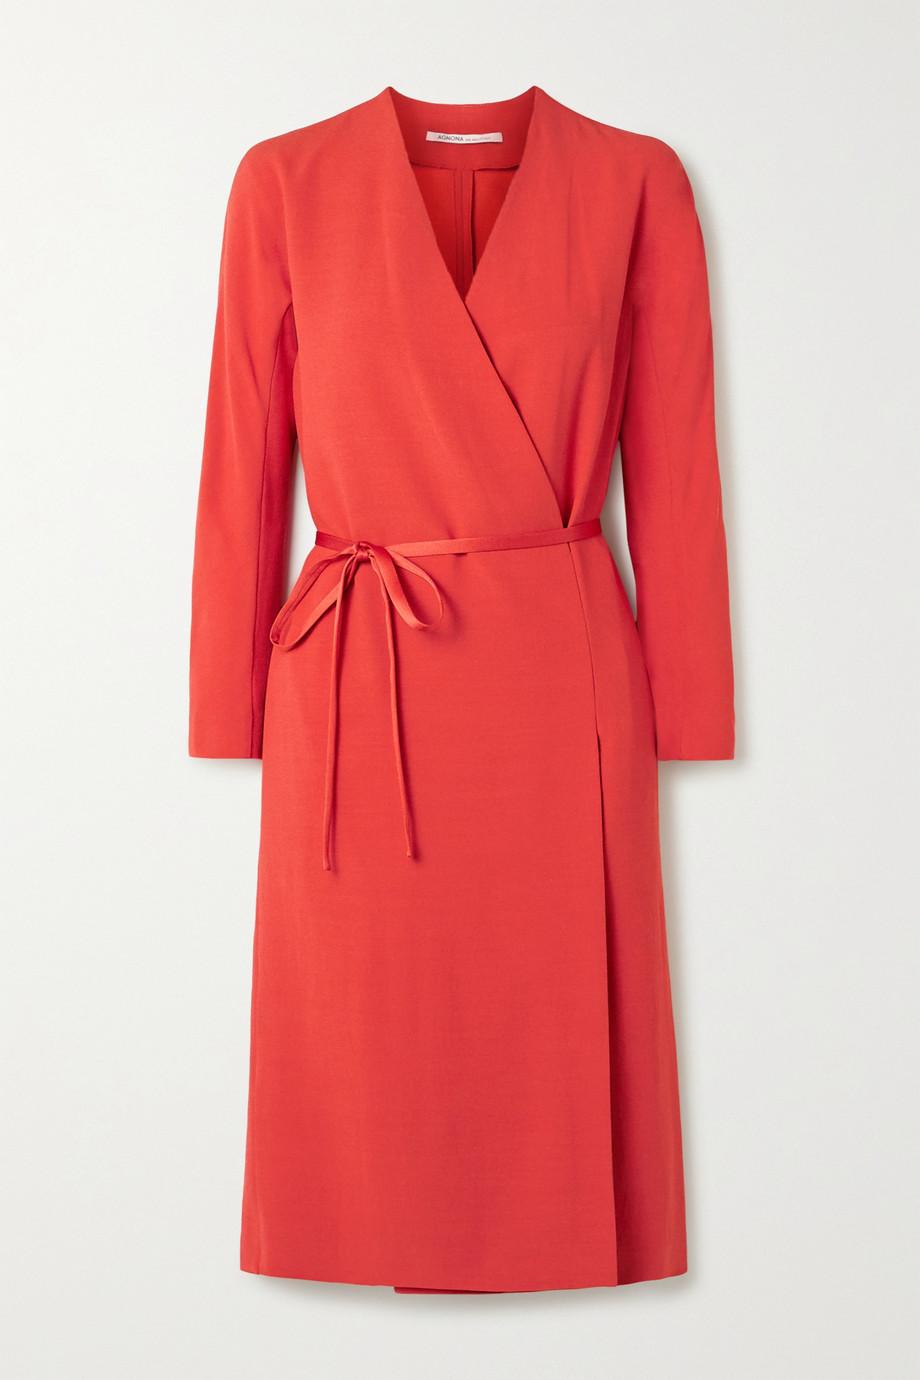 Agnona Crepe wrap dress